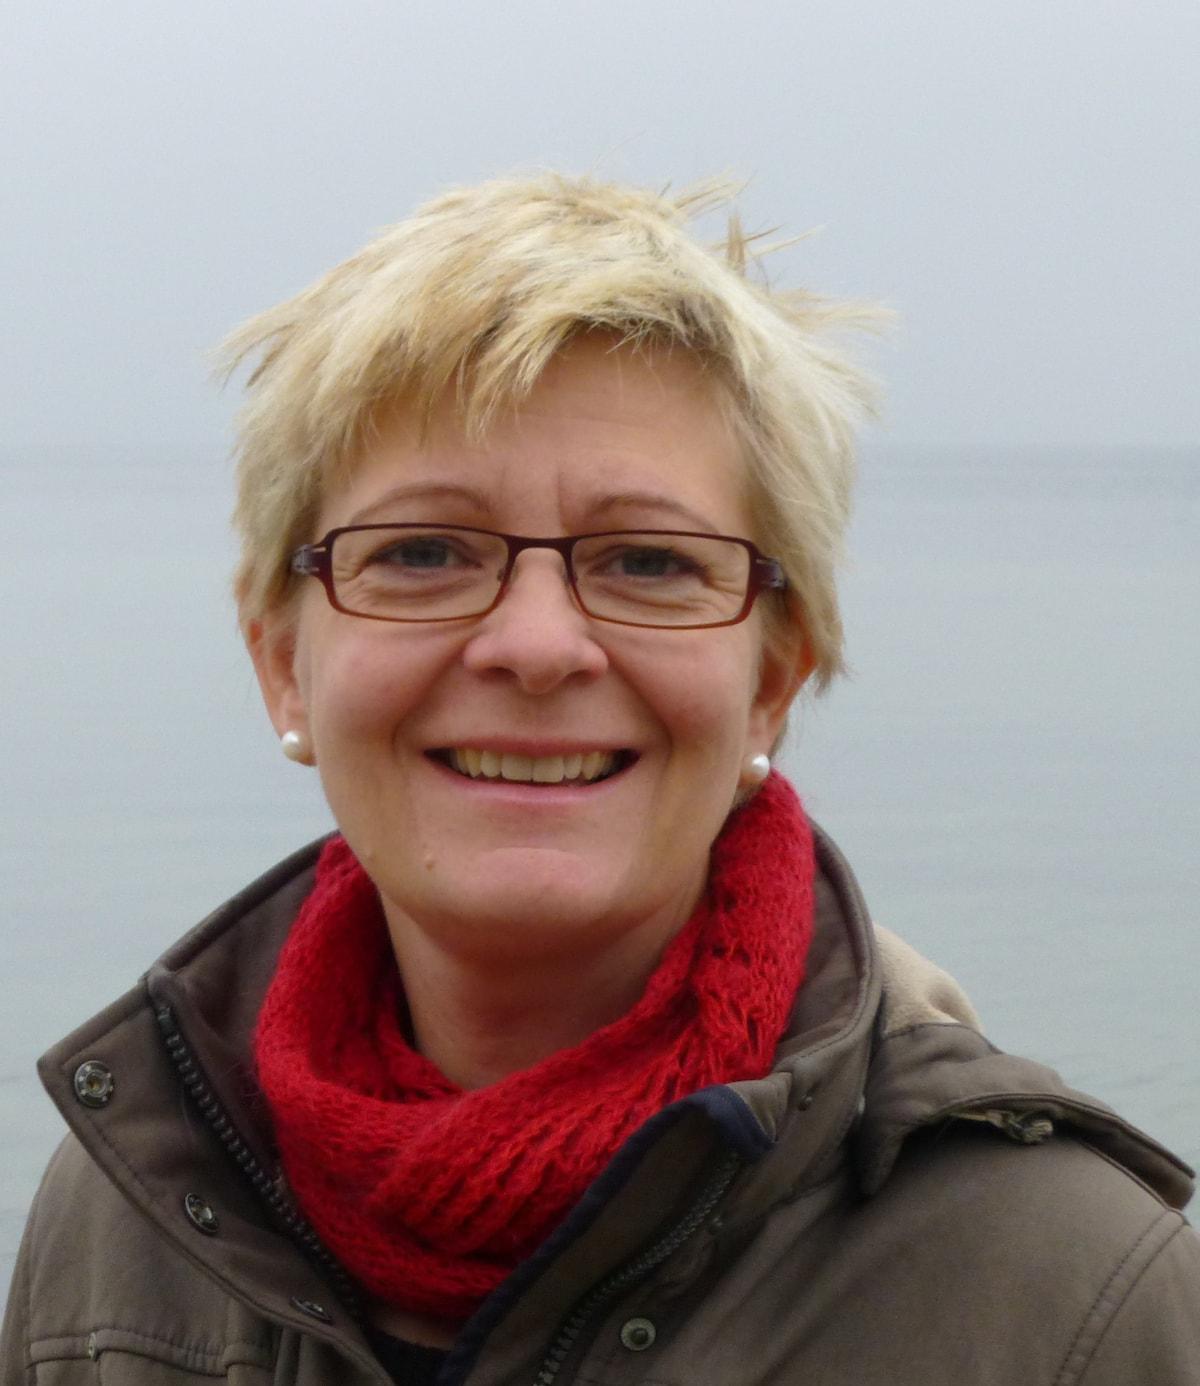 Charlotte from Tranekær